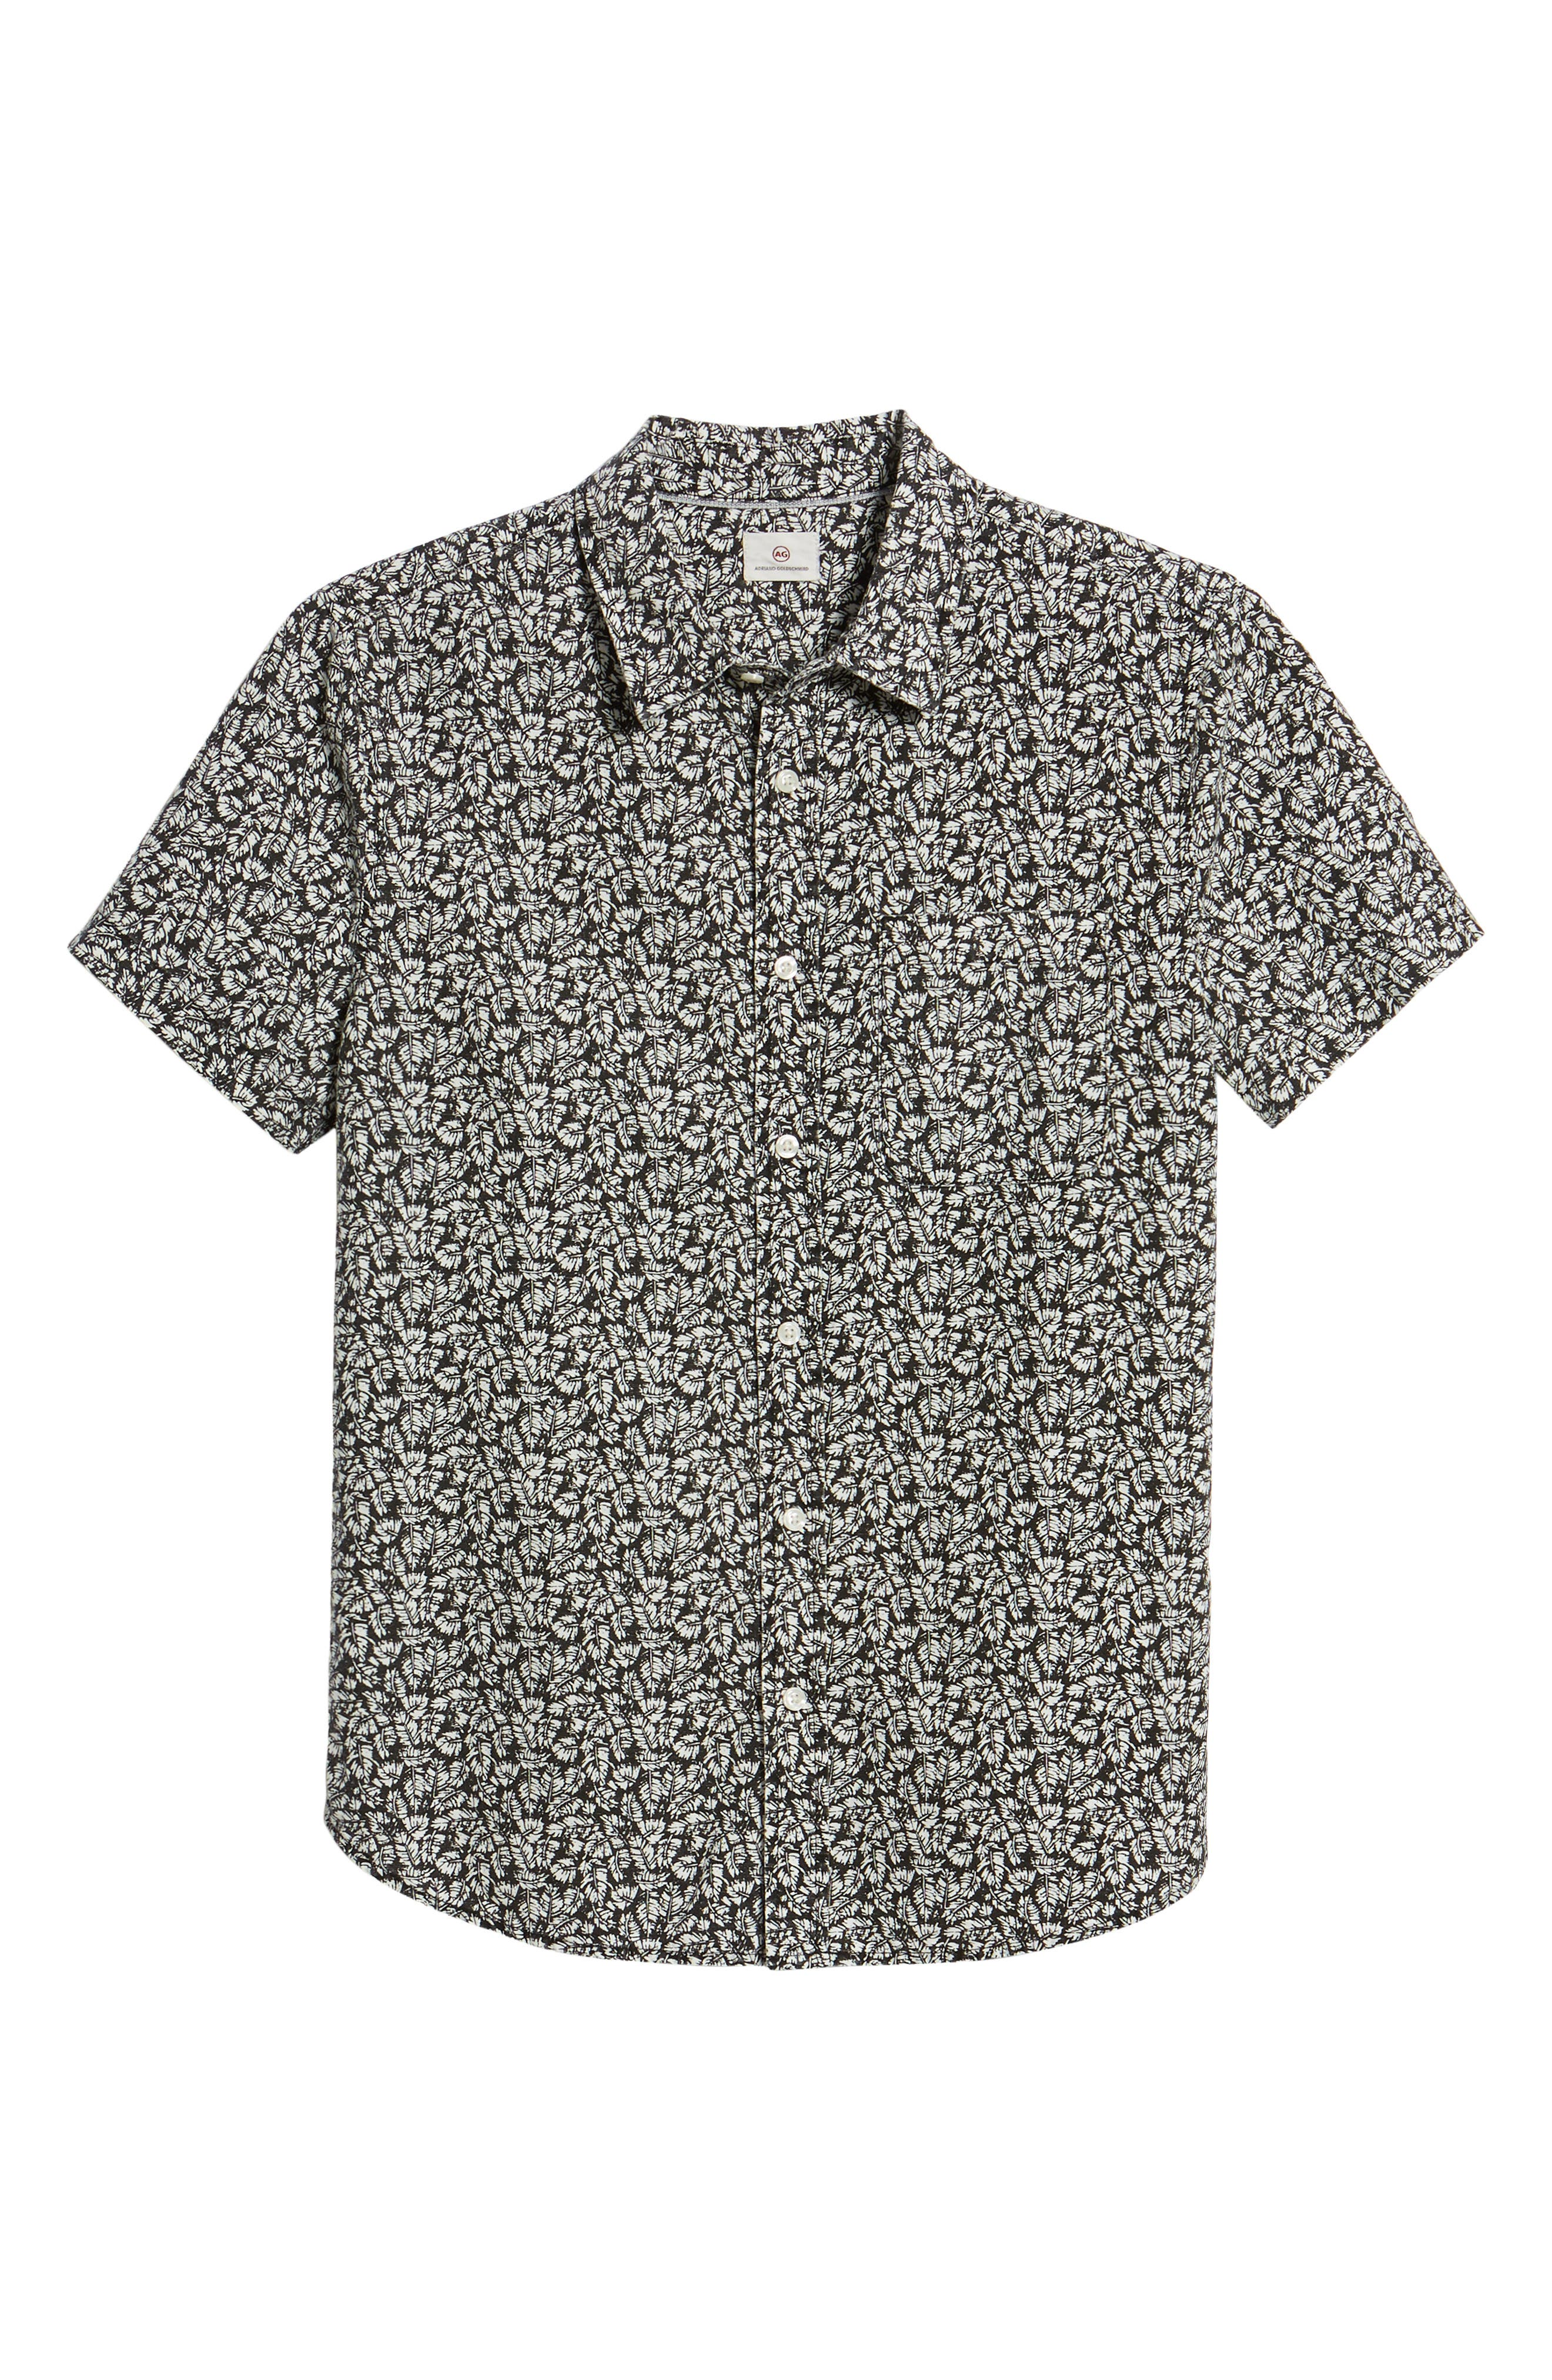 Nash Regular Fit Short Sleeve Sport Shirt,                             Alternate thumbnail 6, color,                             015